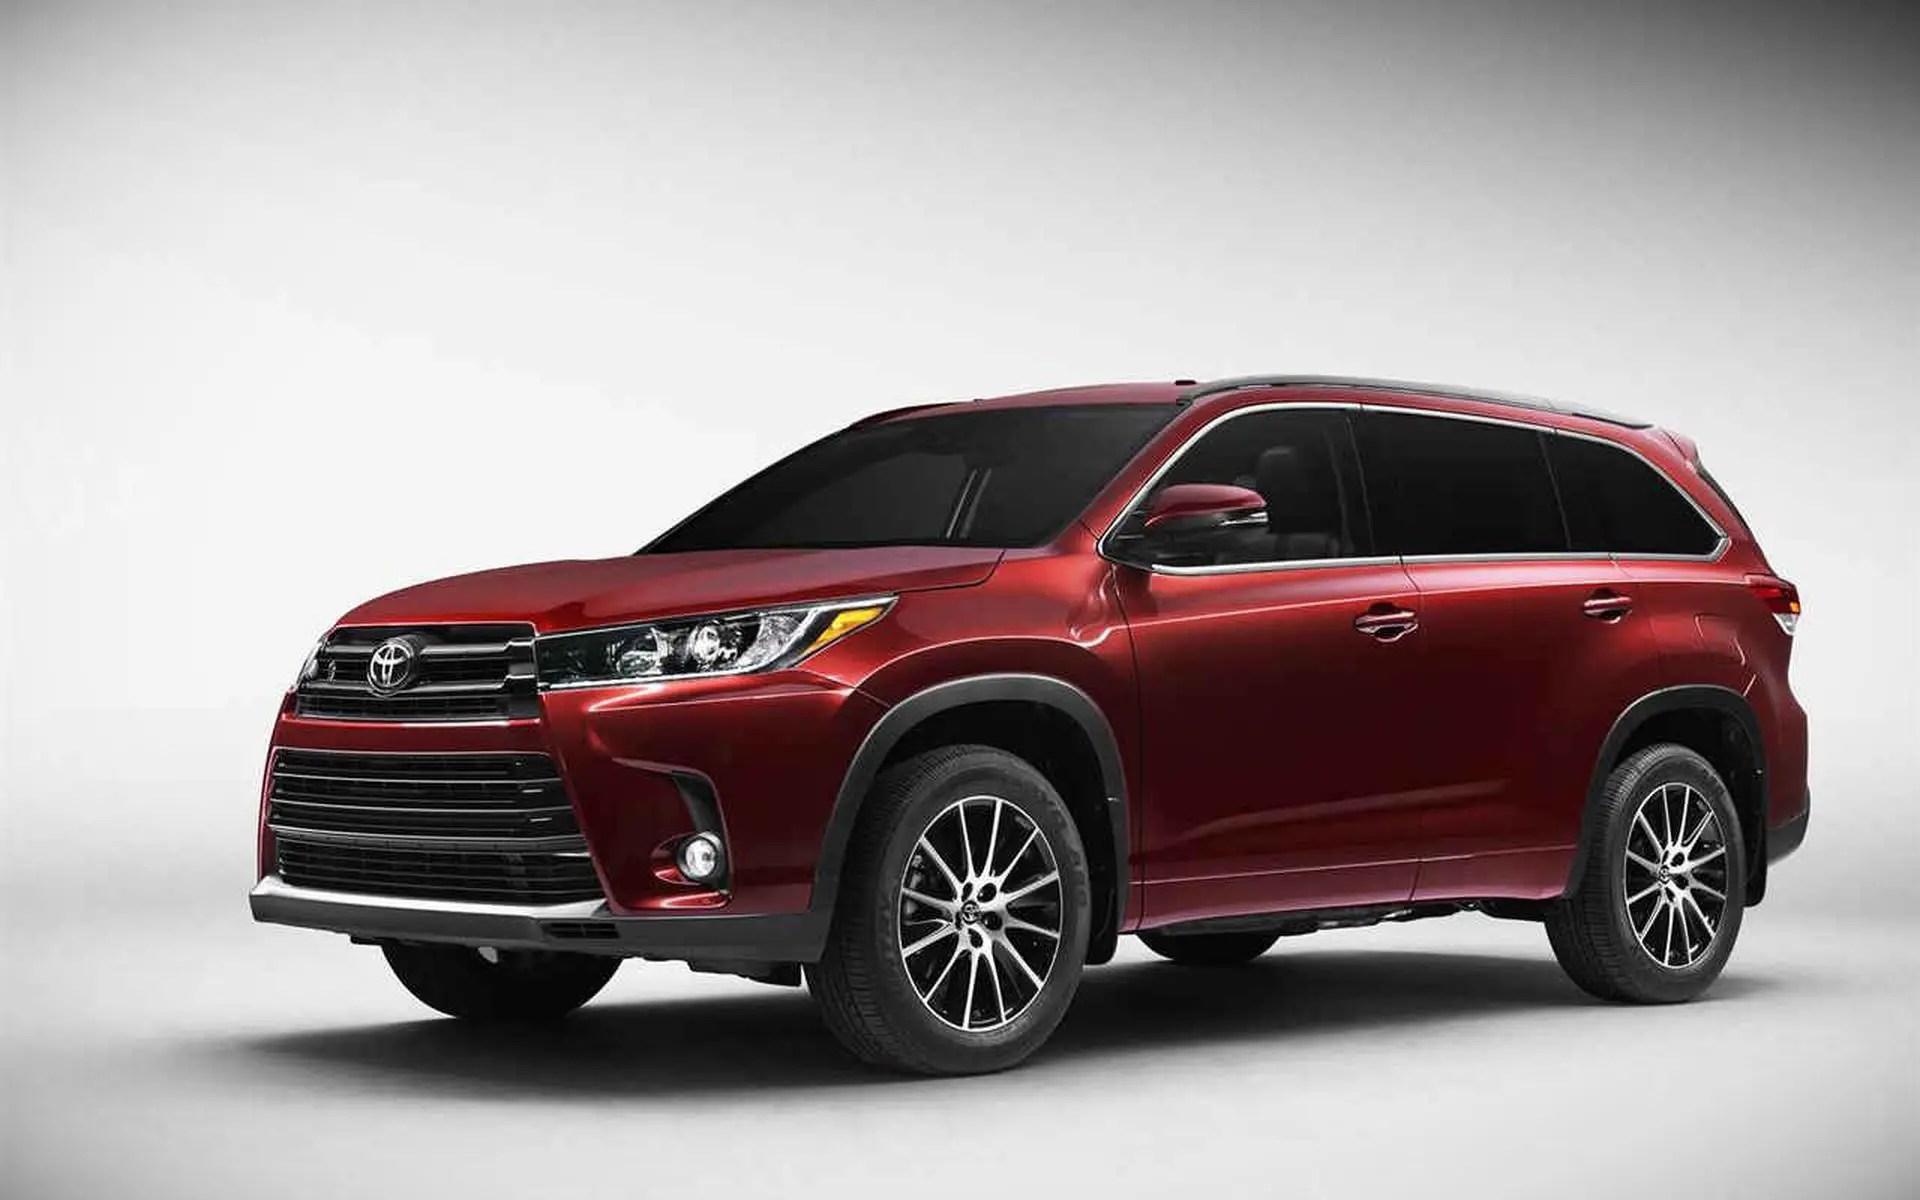 New Toyota Highlander - Best 6 Passenger SUVs 2020